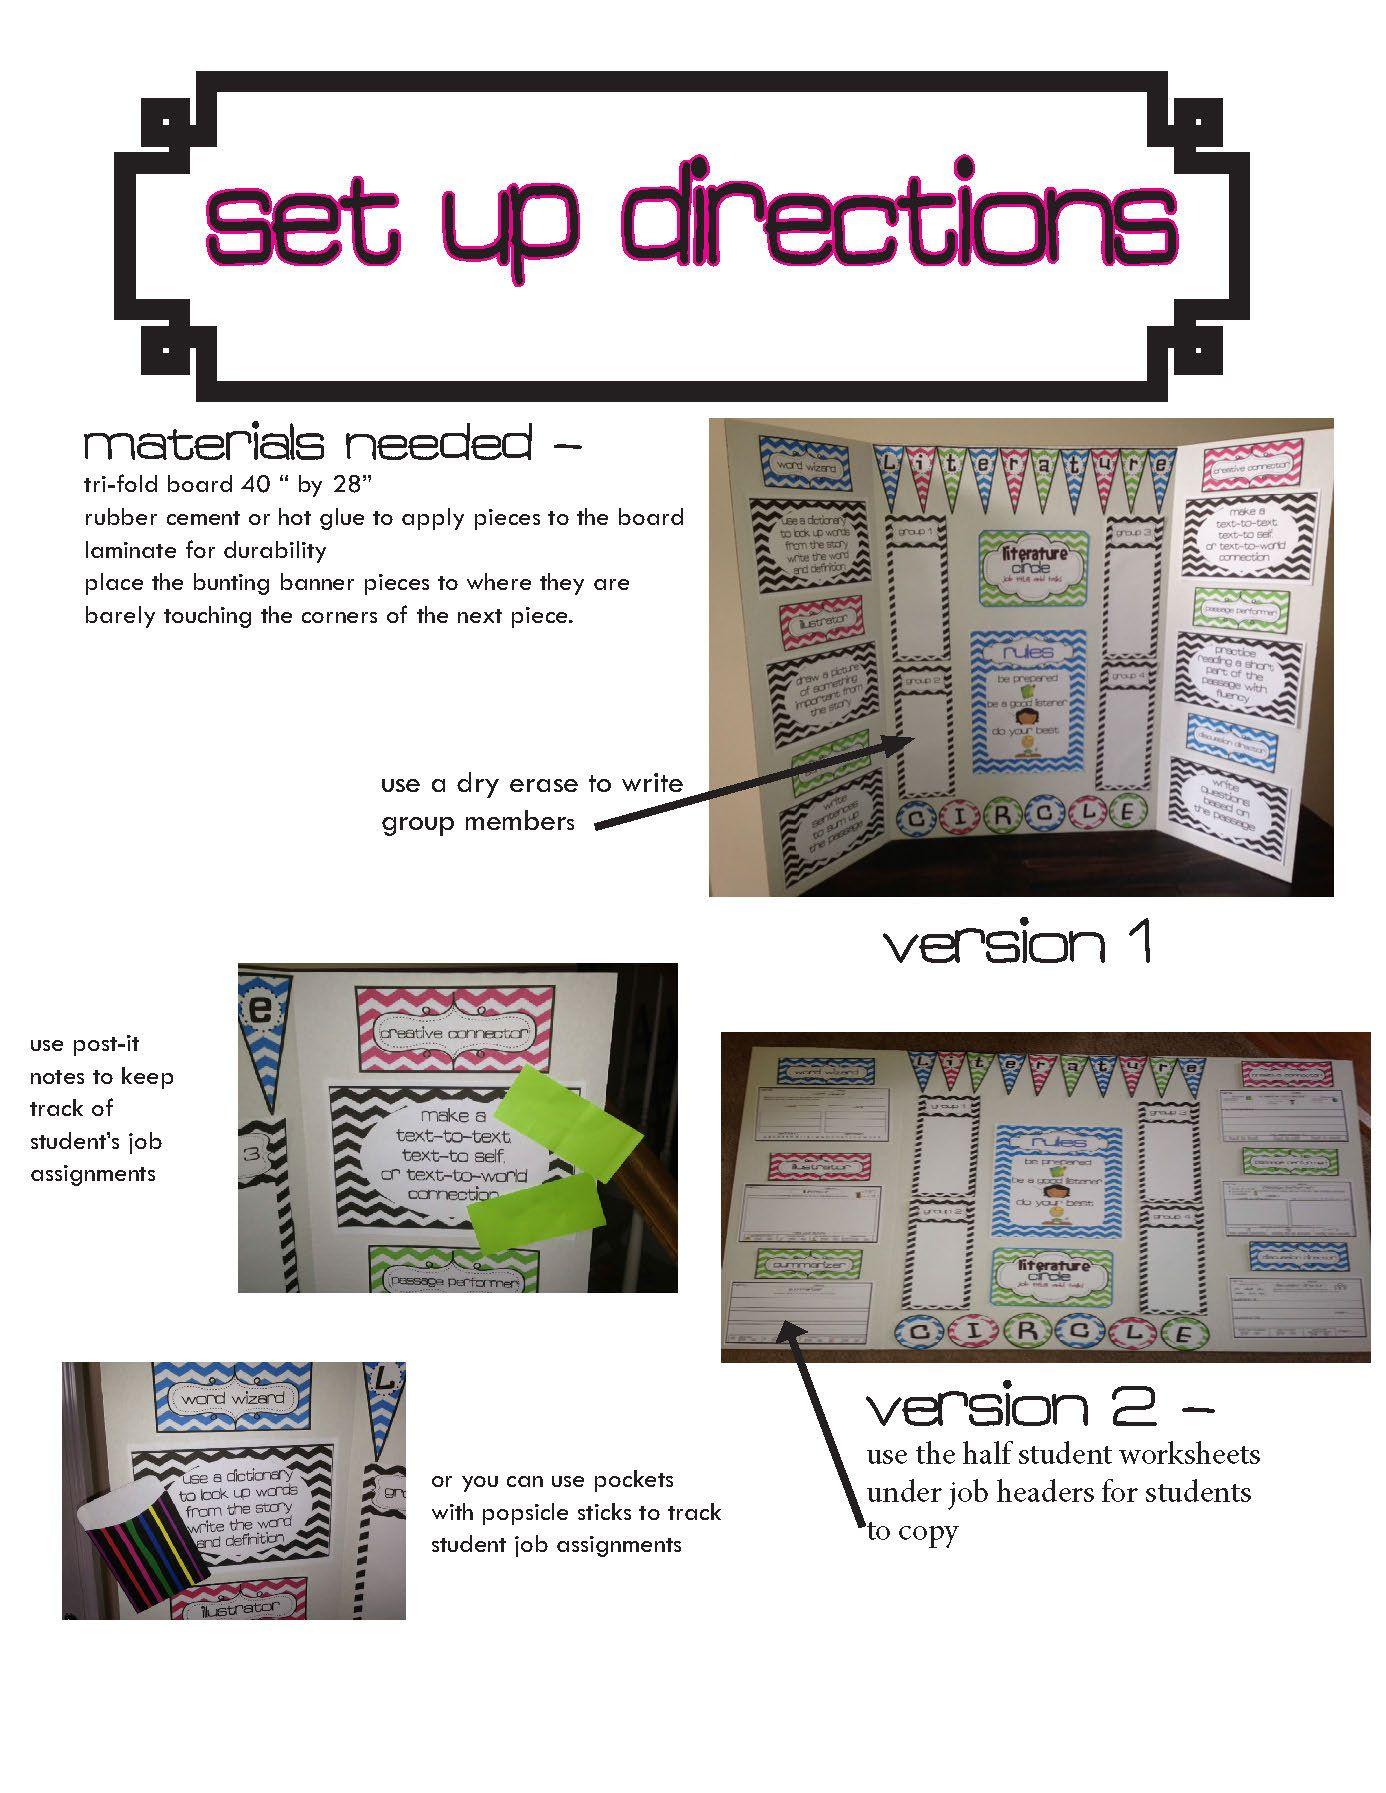 Literature Circle Task Management Display Board